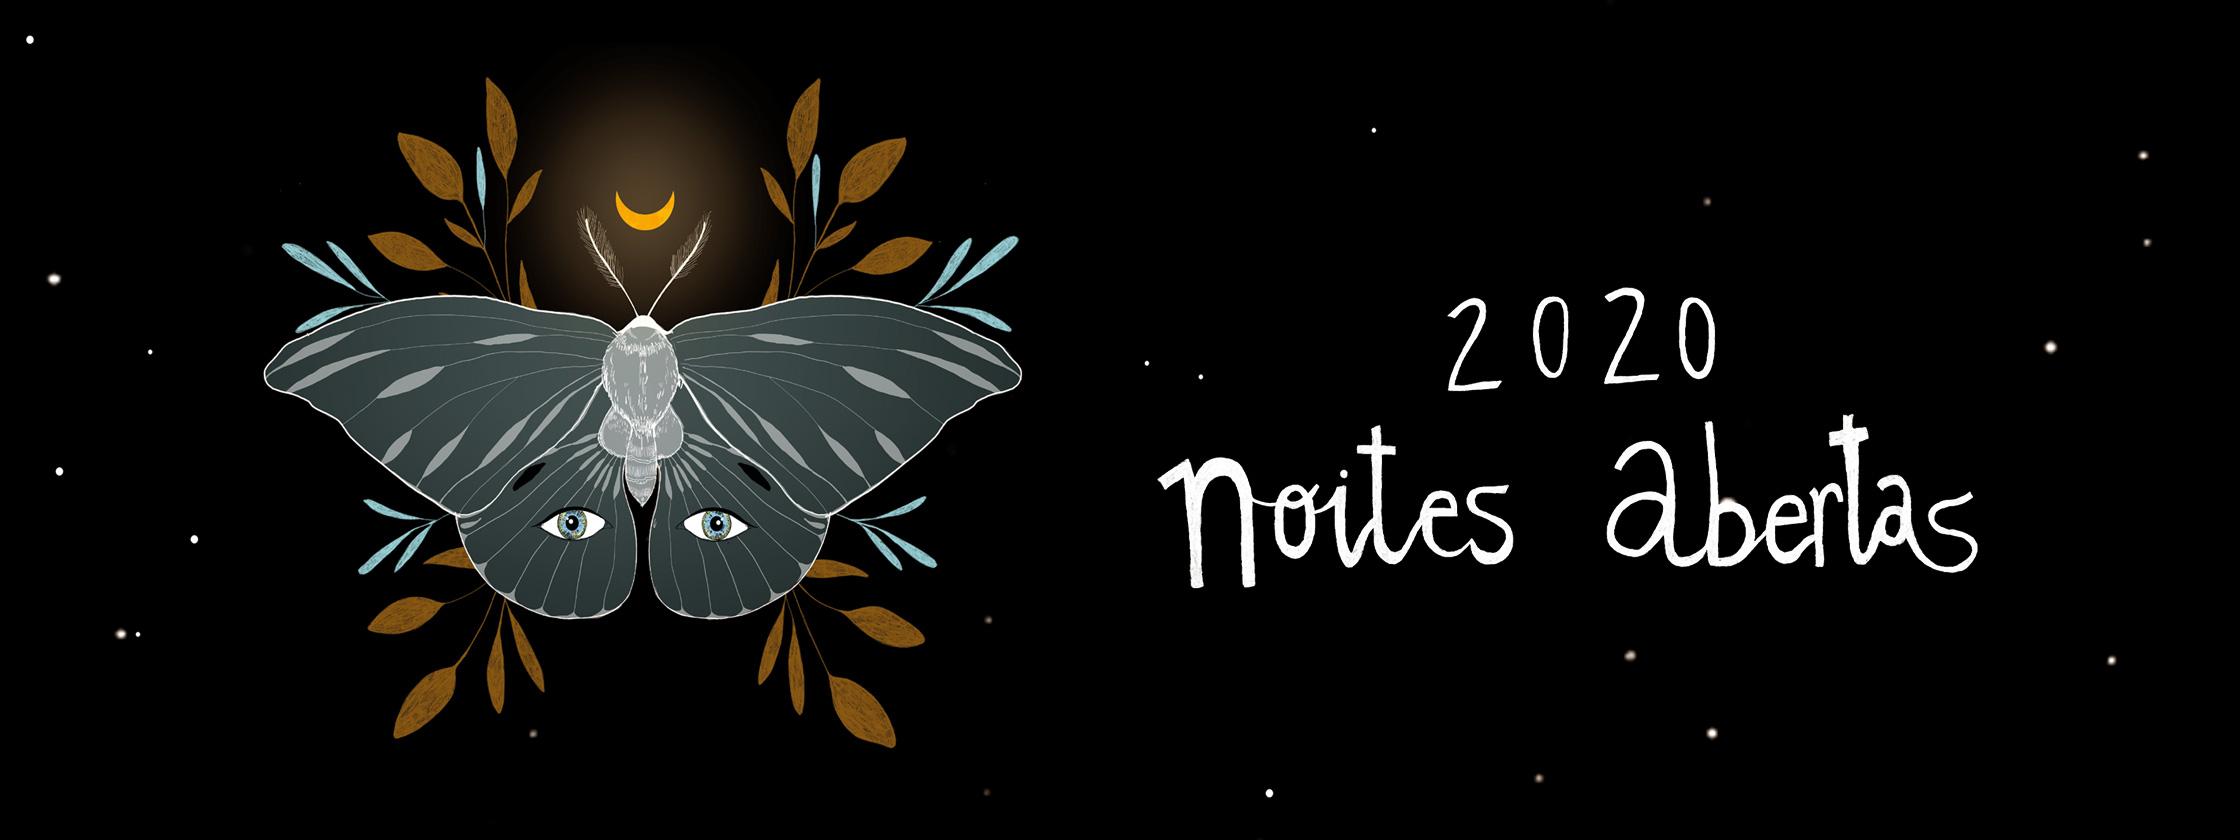 Noites Abertas - Cabeceira 2020